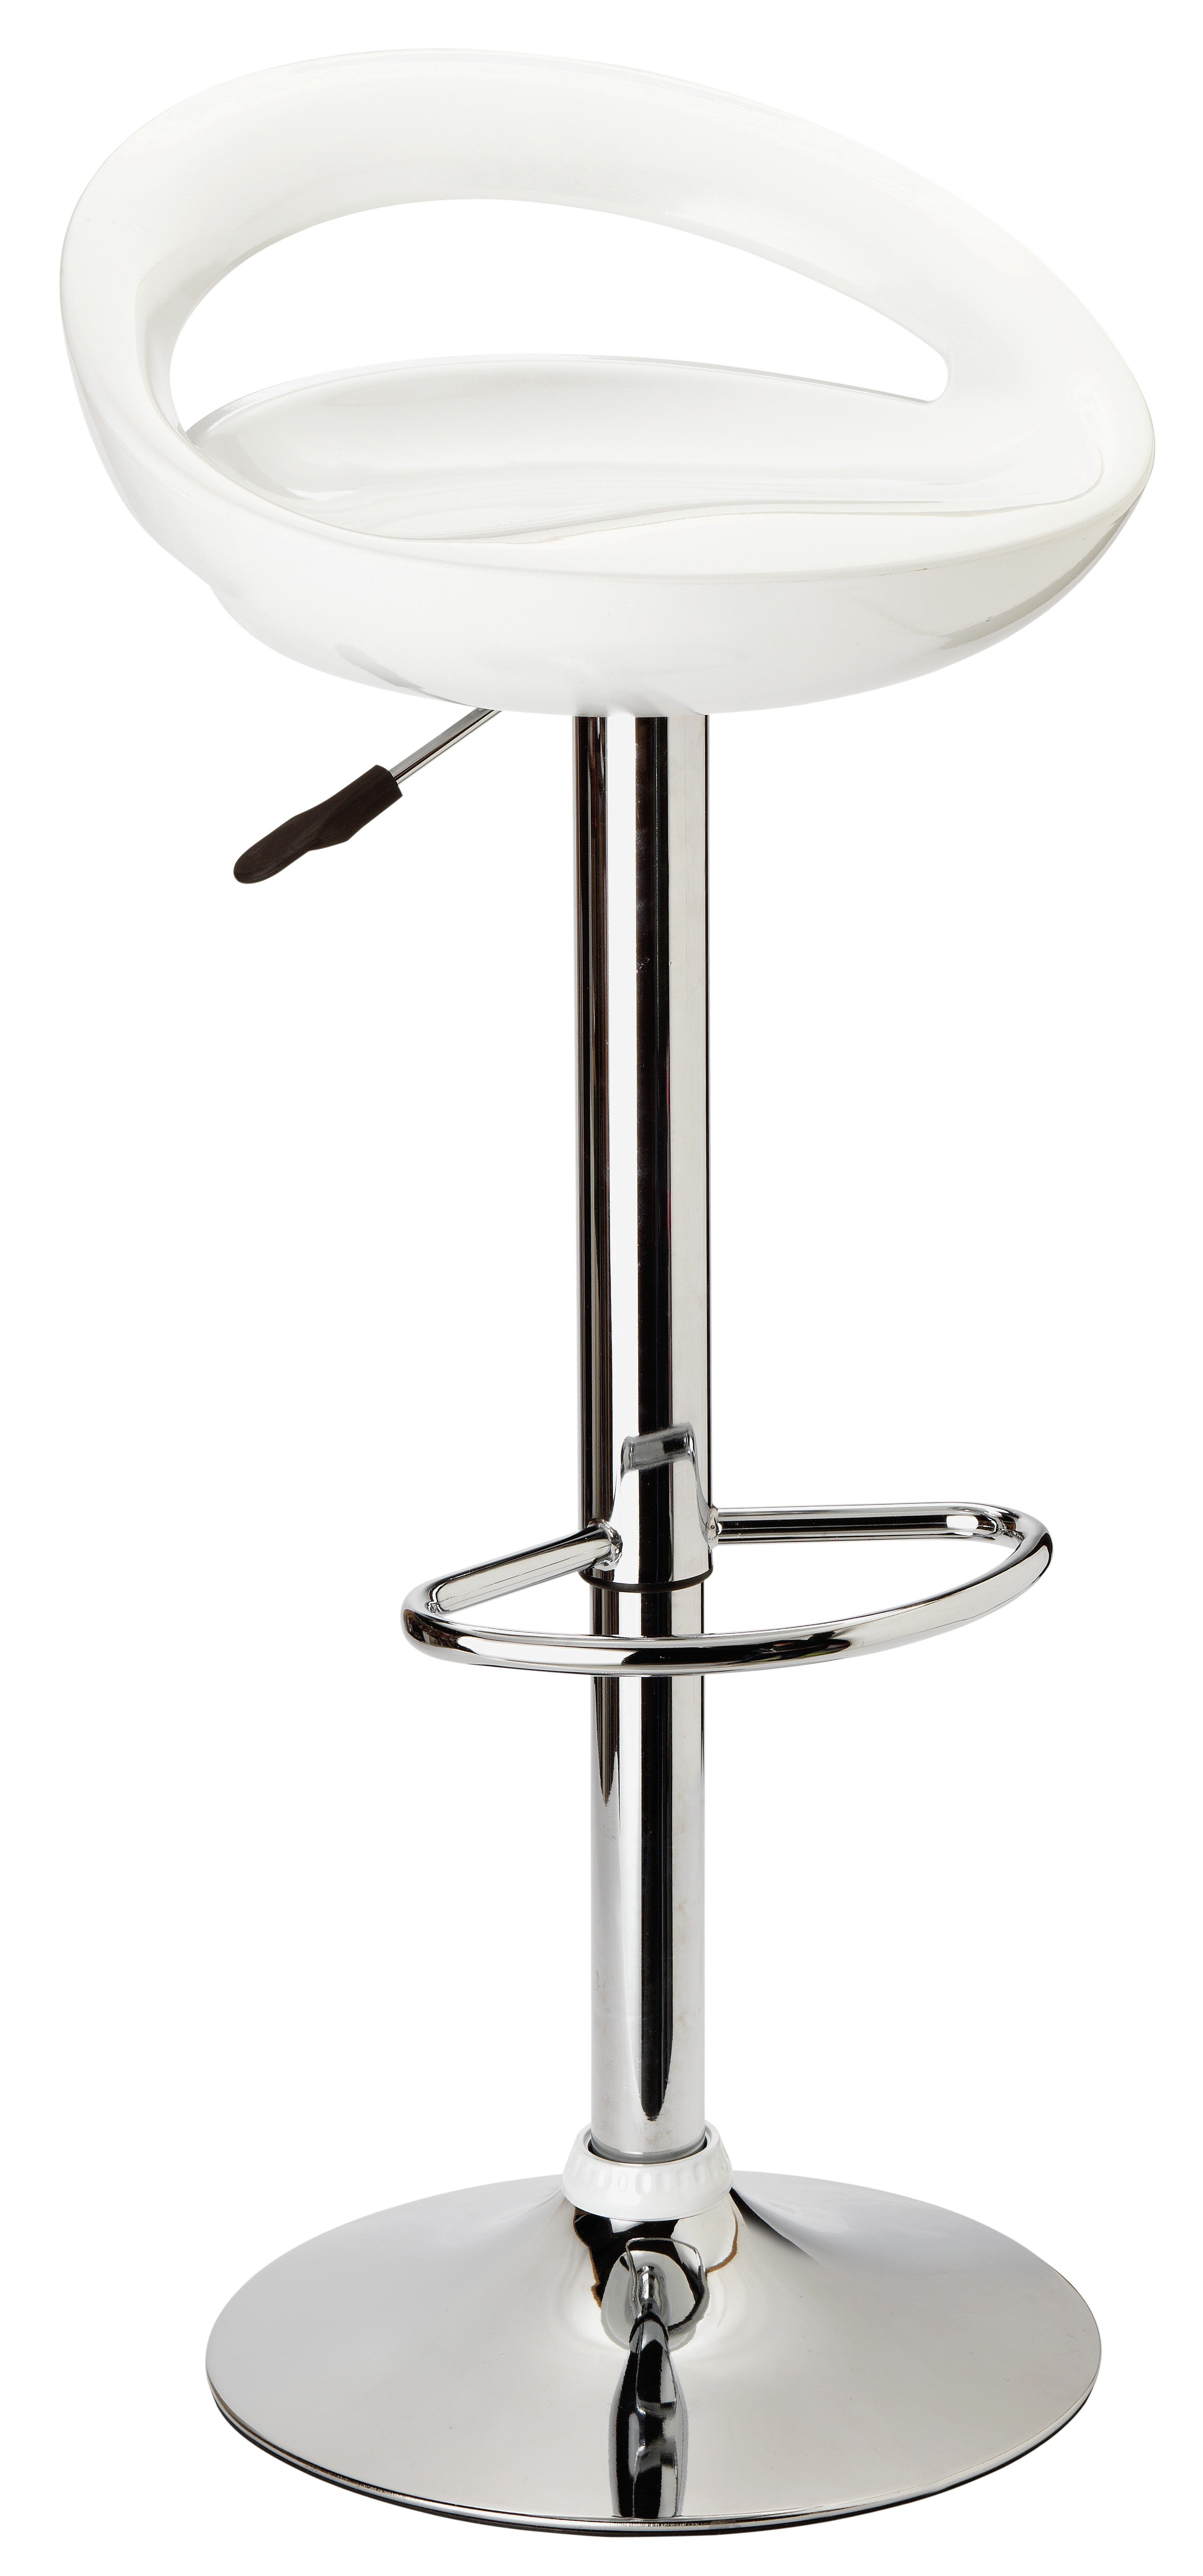 Pleasant Buy Argos Home Ottawa White Bar Stool Bar Stools Argos Theyellowbook Wood Chair Design Ideas Theyellowbookinfo